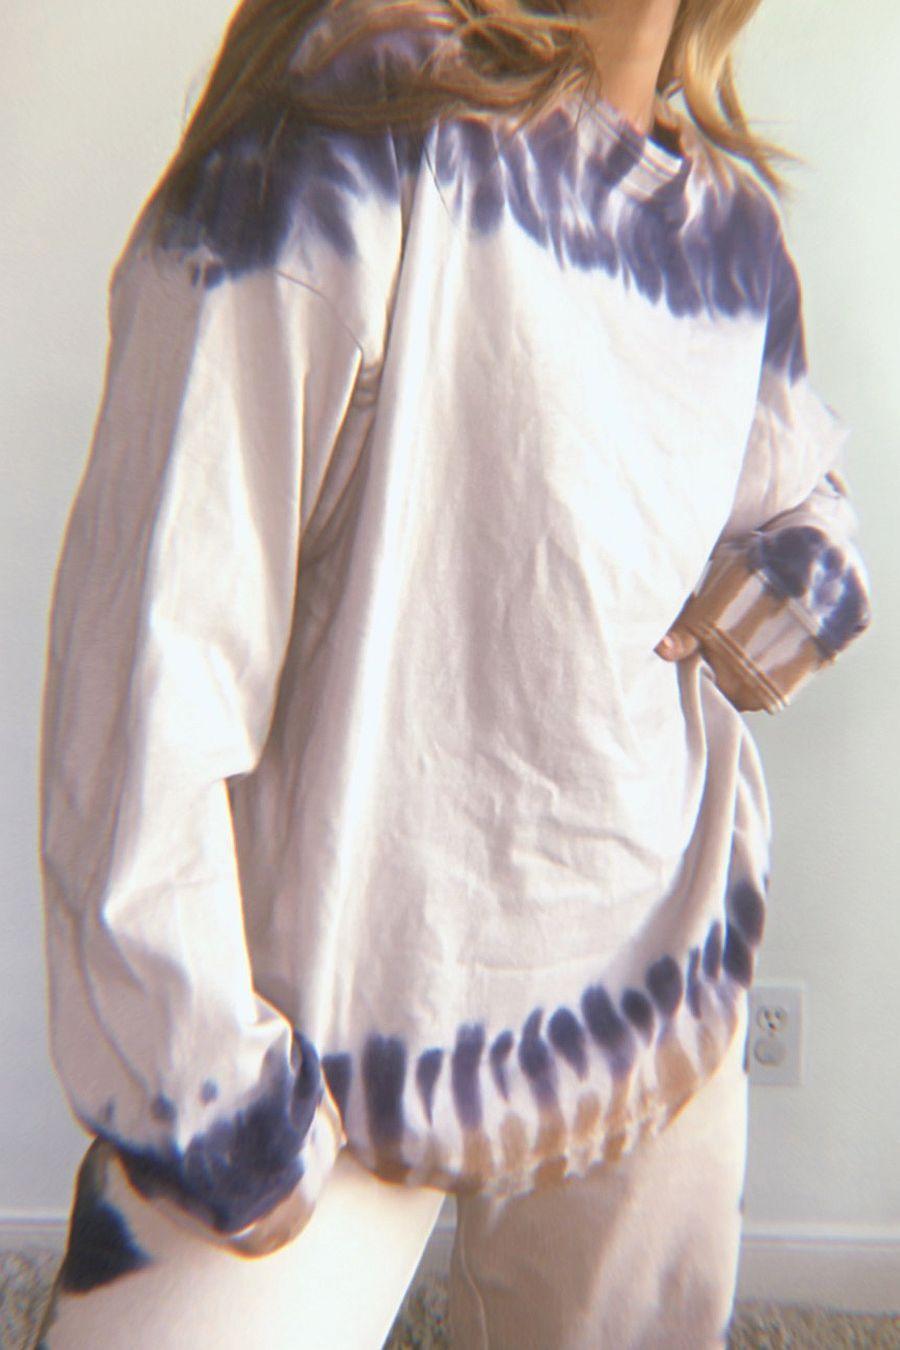 Richer Poorer Relaxed Long Sleeve Tee - Tie Dye